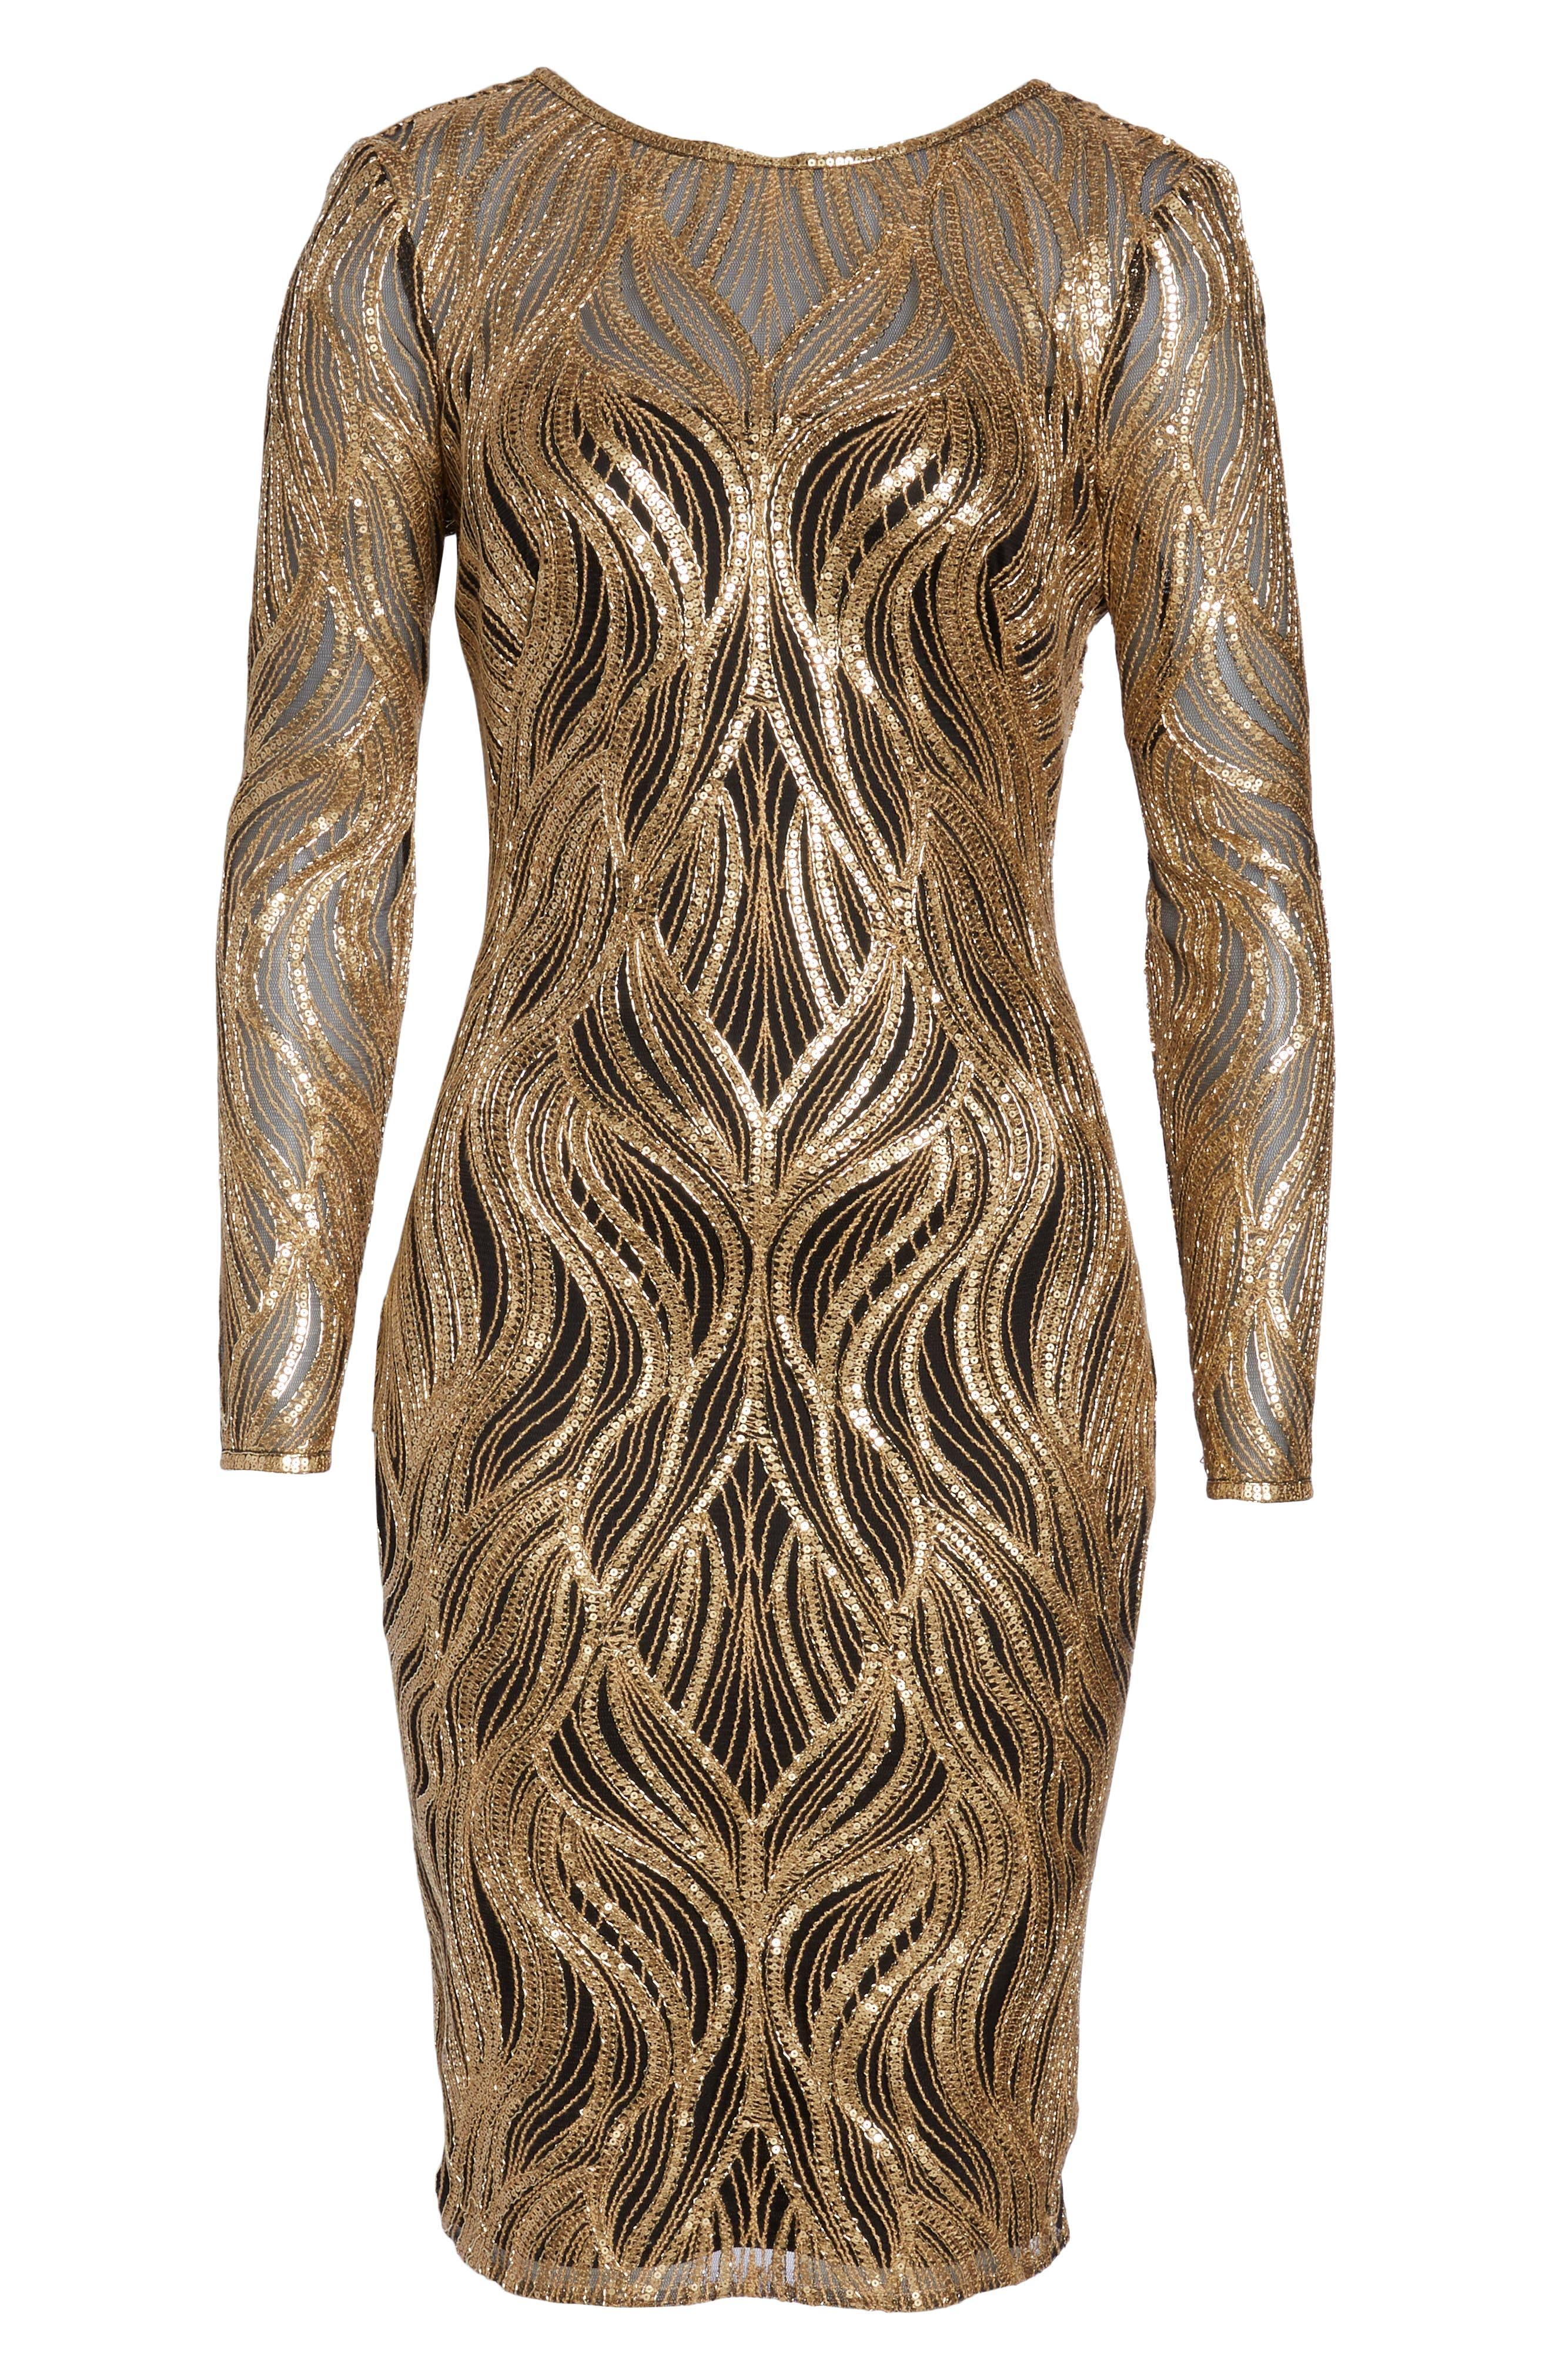 Long Sleeve Sequin Mesh Cocktail Dress,                             Alternate thumbnail 7, color,                             GOLD/ BLACK